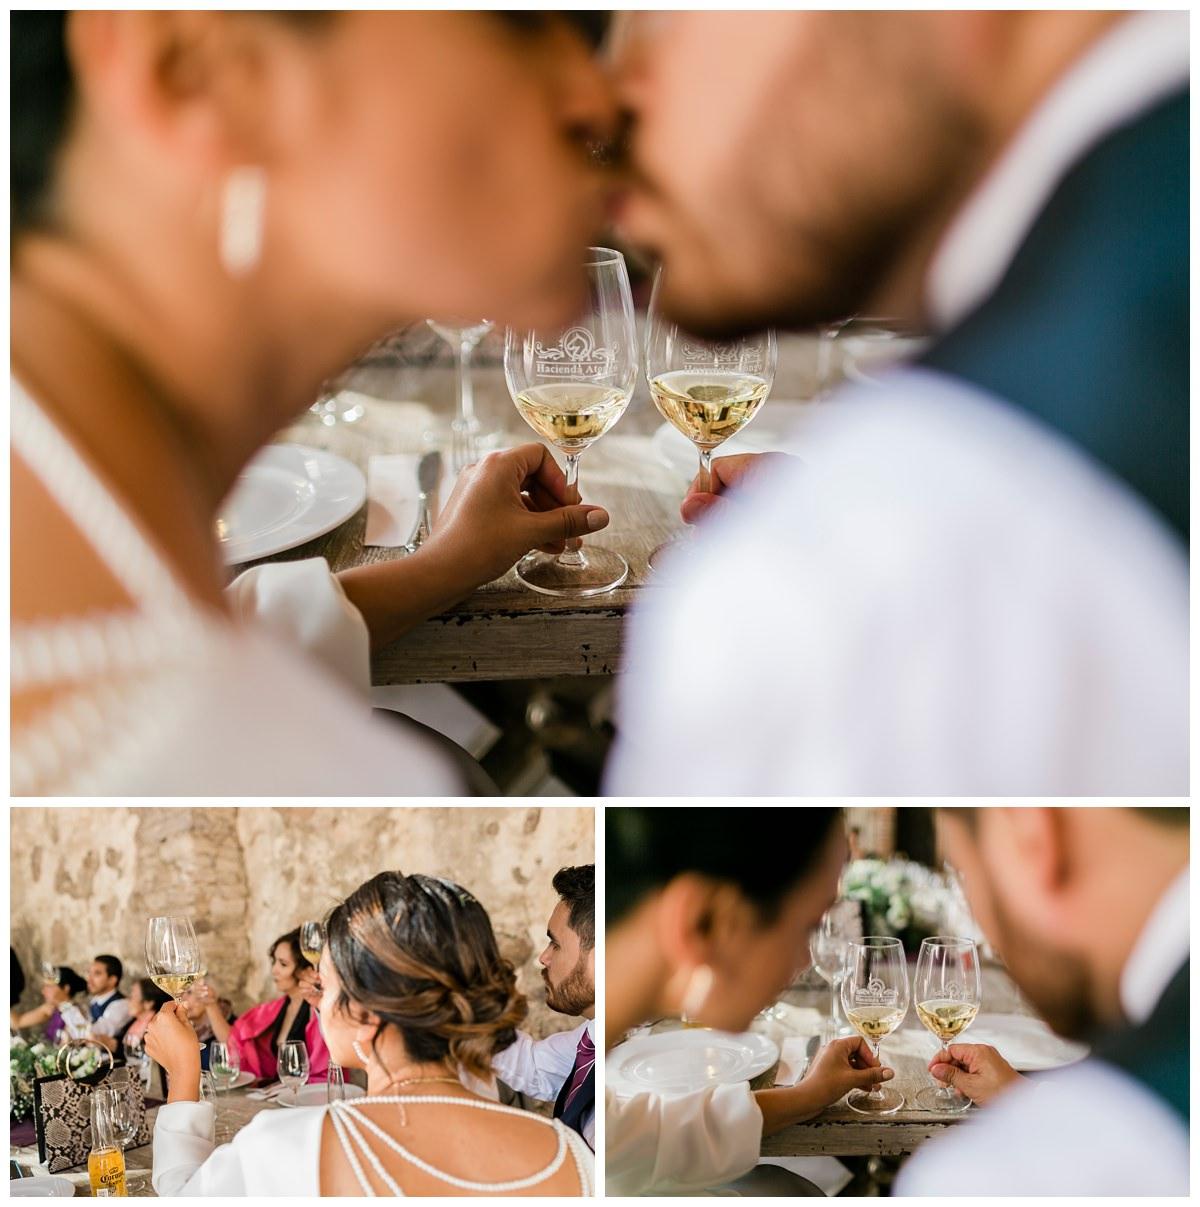 vineyard wedding experience ale-vic Hacienda Atongo_ wedding photographer Marcos Valdes